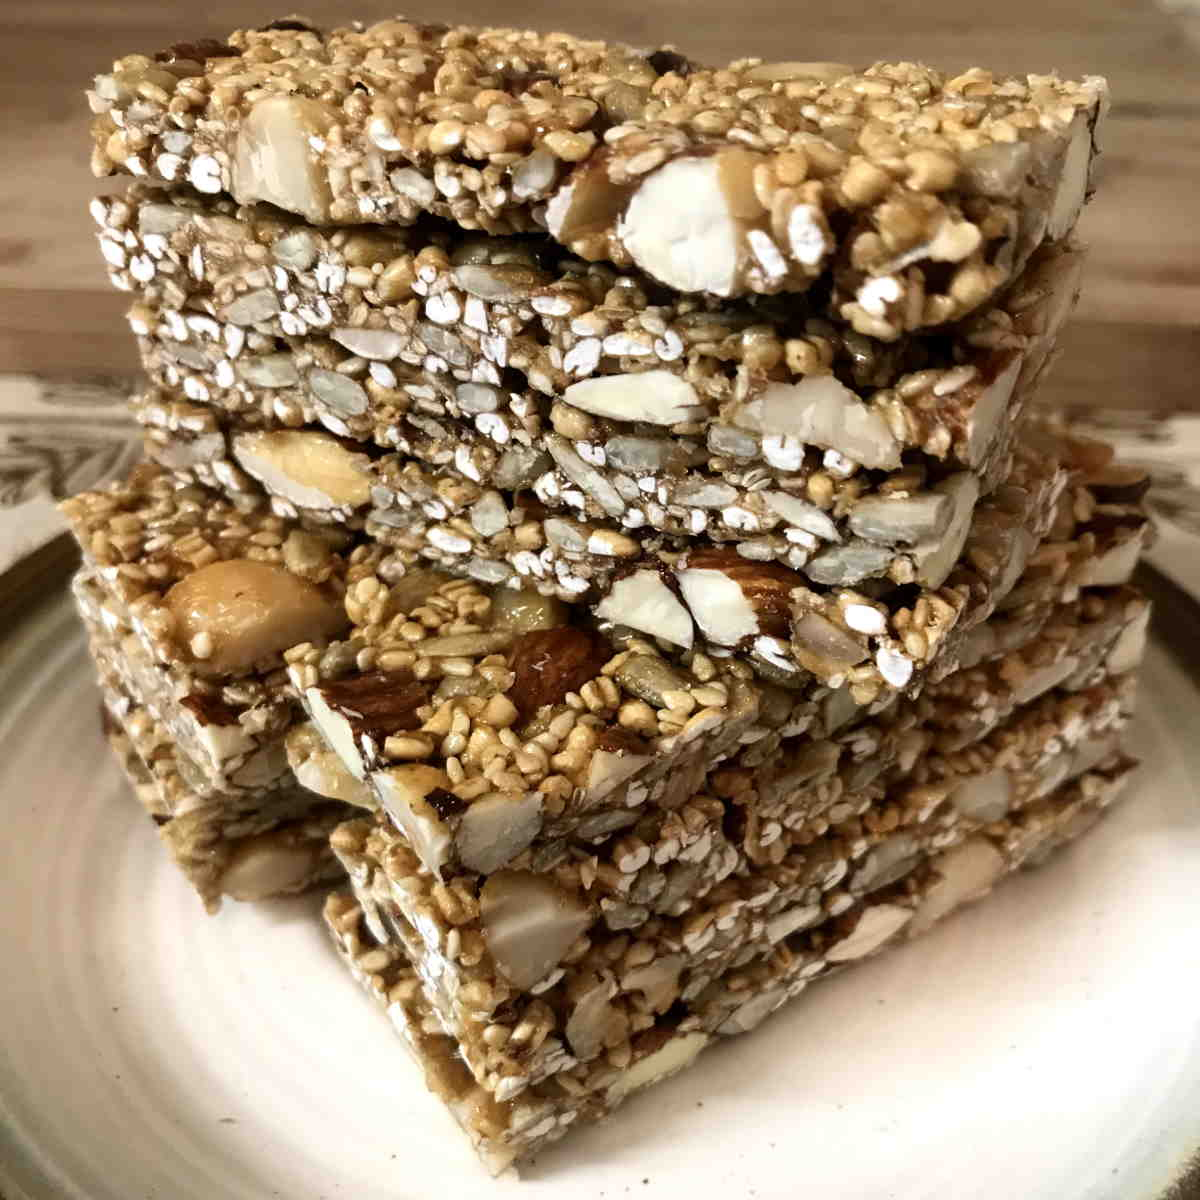 Triple Stack of Caramel Nut Crunch Bars